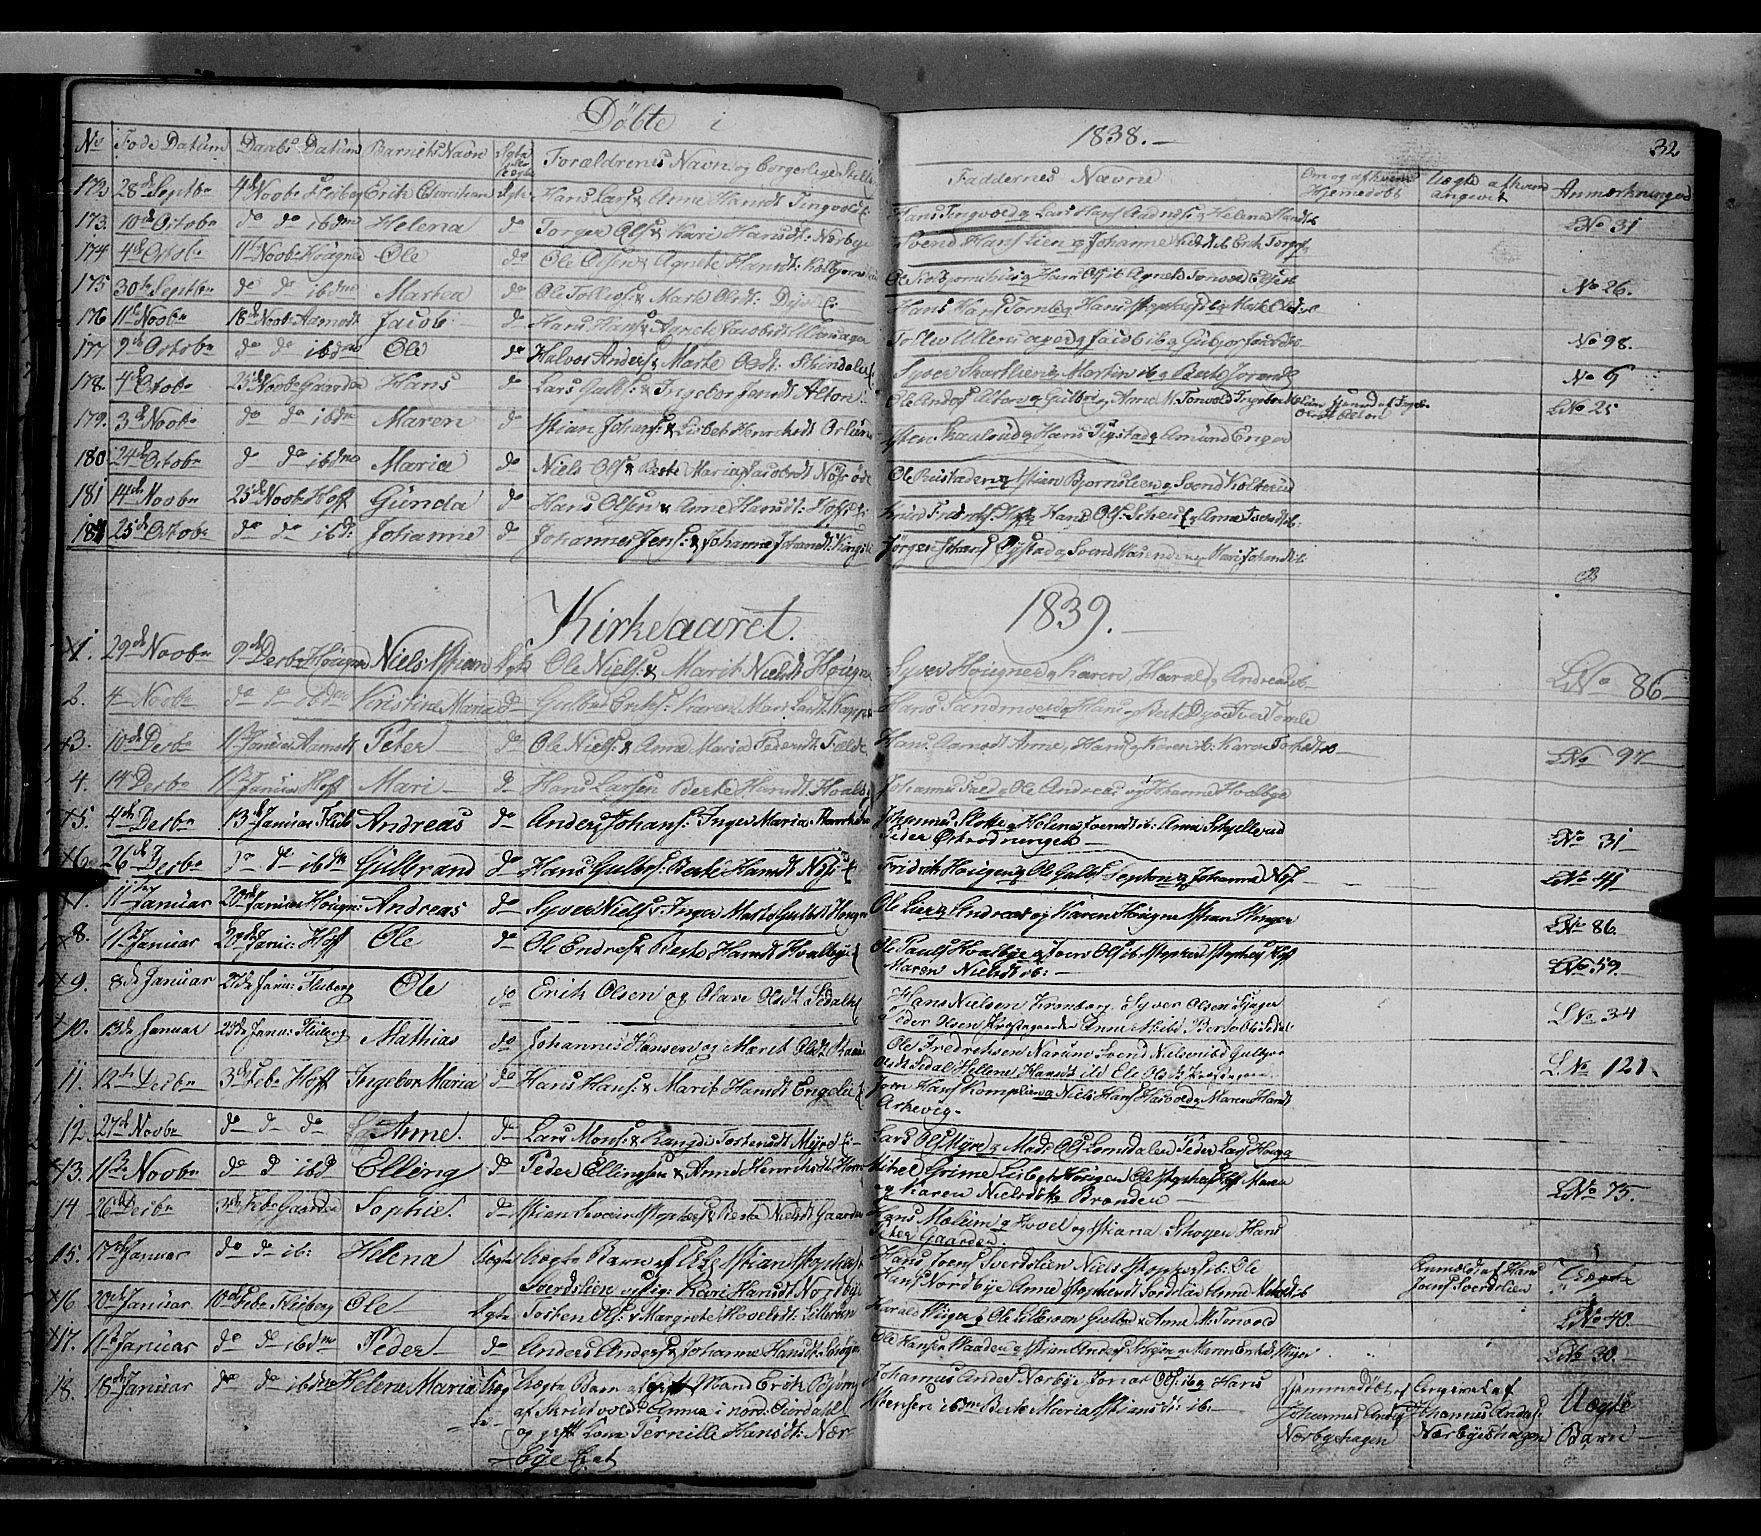 SAH, Land prestekontor, Klokkerbok nr. 2, 1833-1849, s. 32